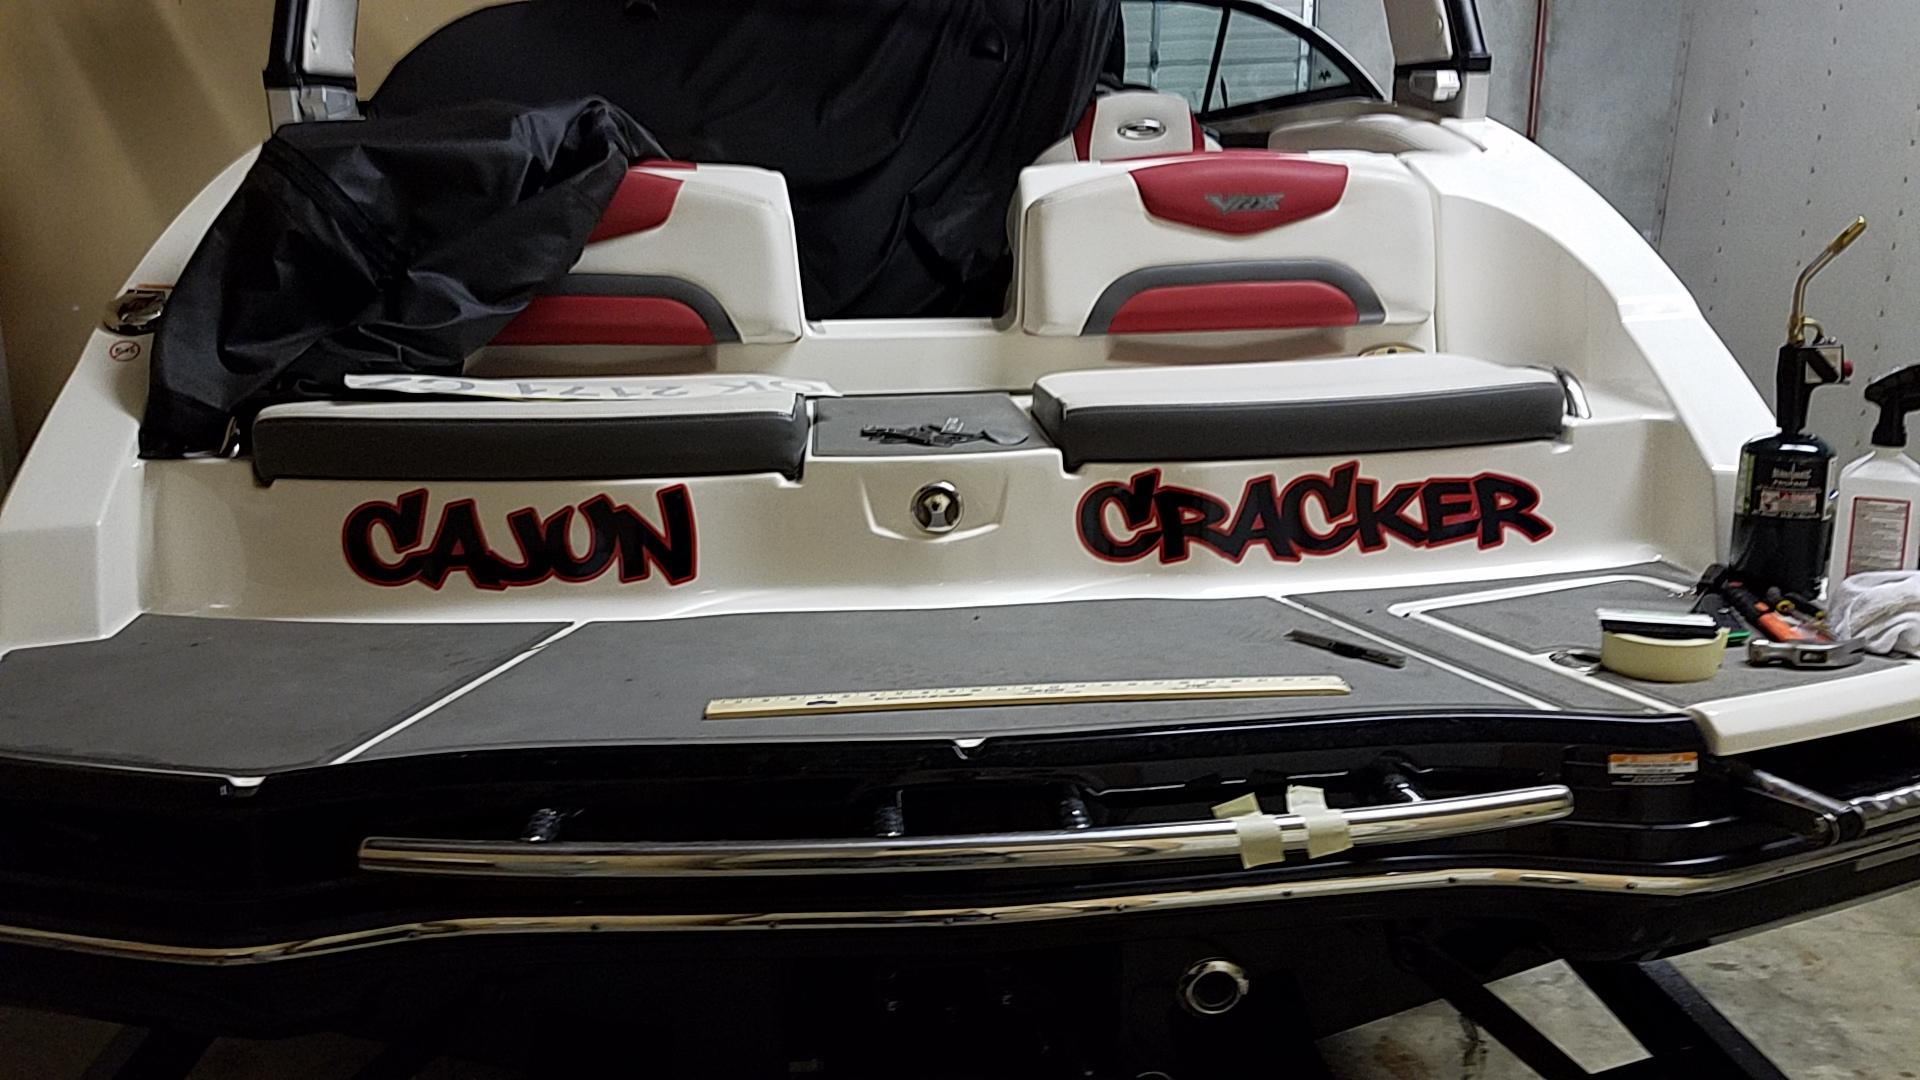 Cajun Cracker - Custom Boat Decal